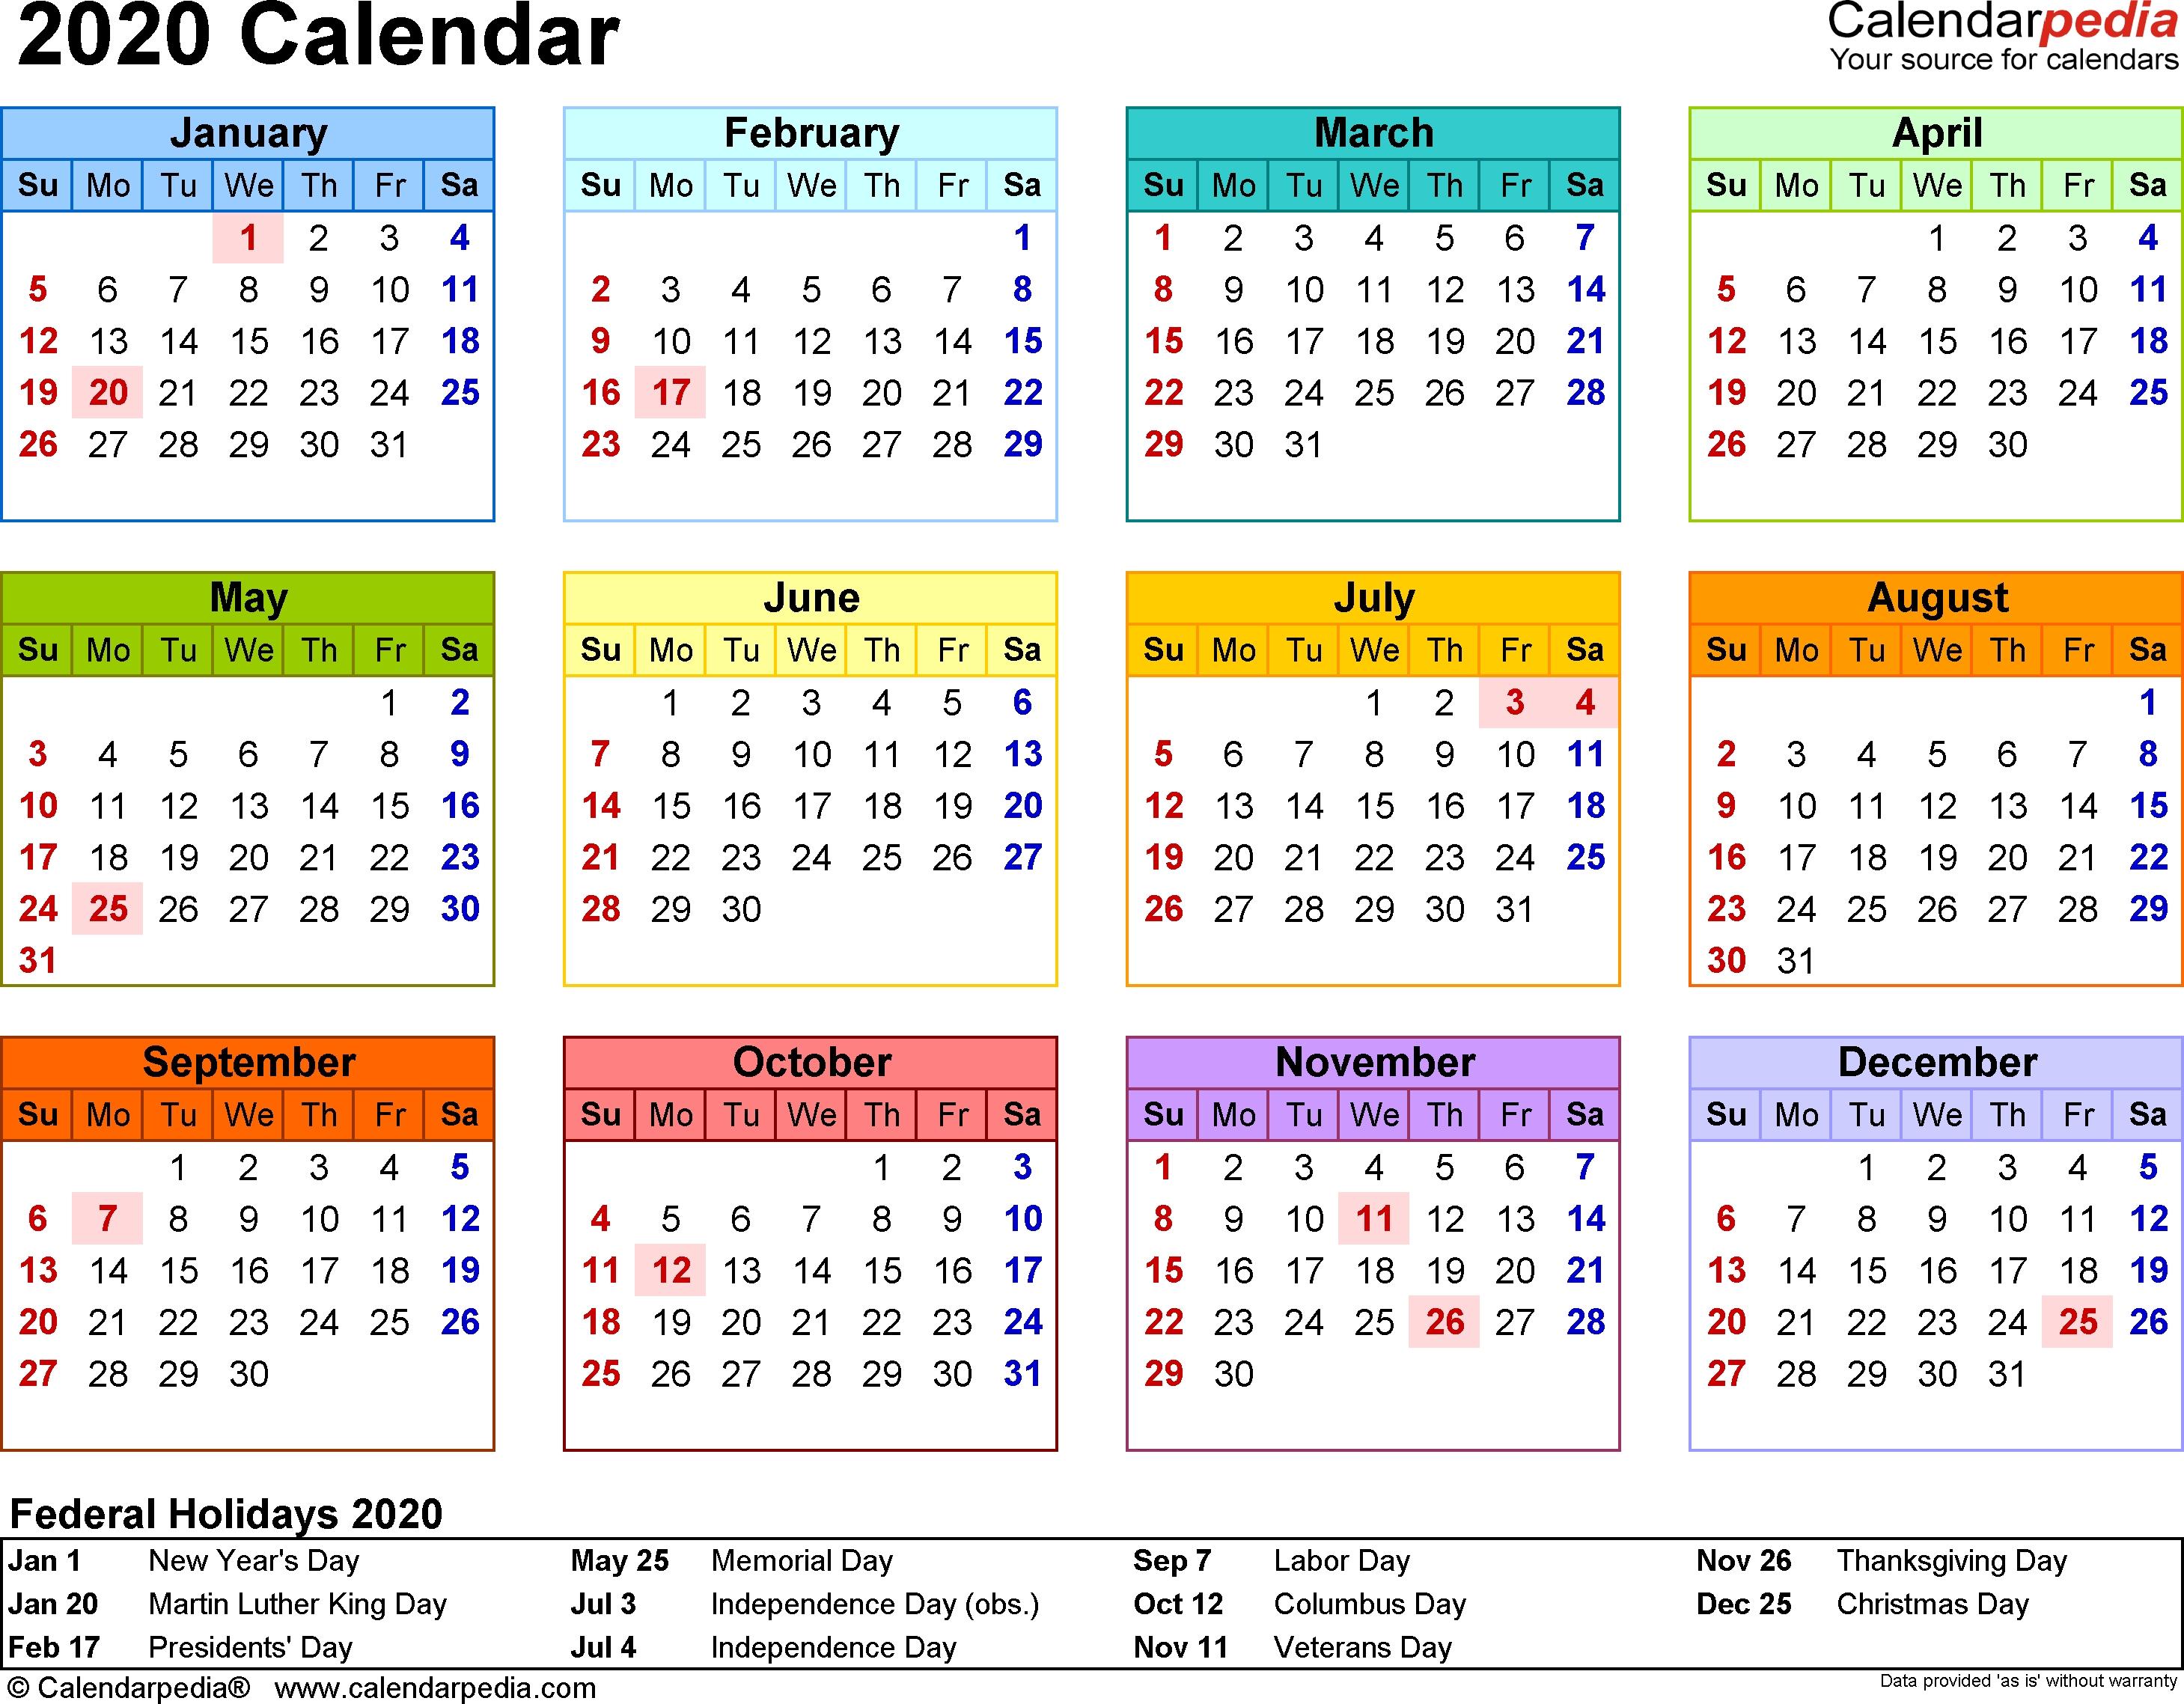 2020 Calendar Pdf - 17 Free Printable Calendar Templates pertaining to Printable Calendar One Week Per Page 2020